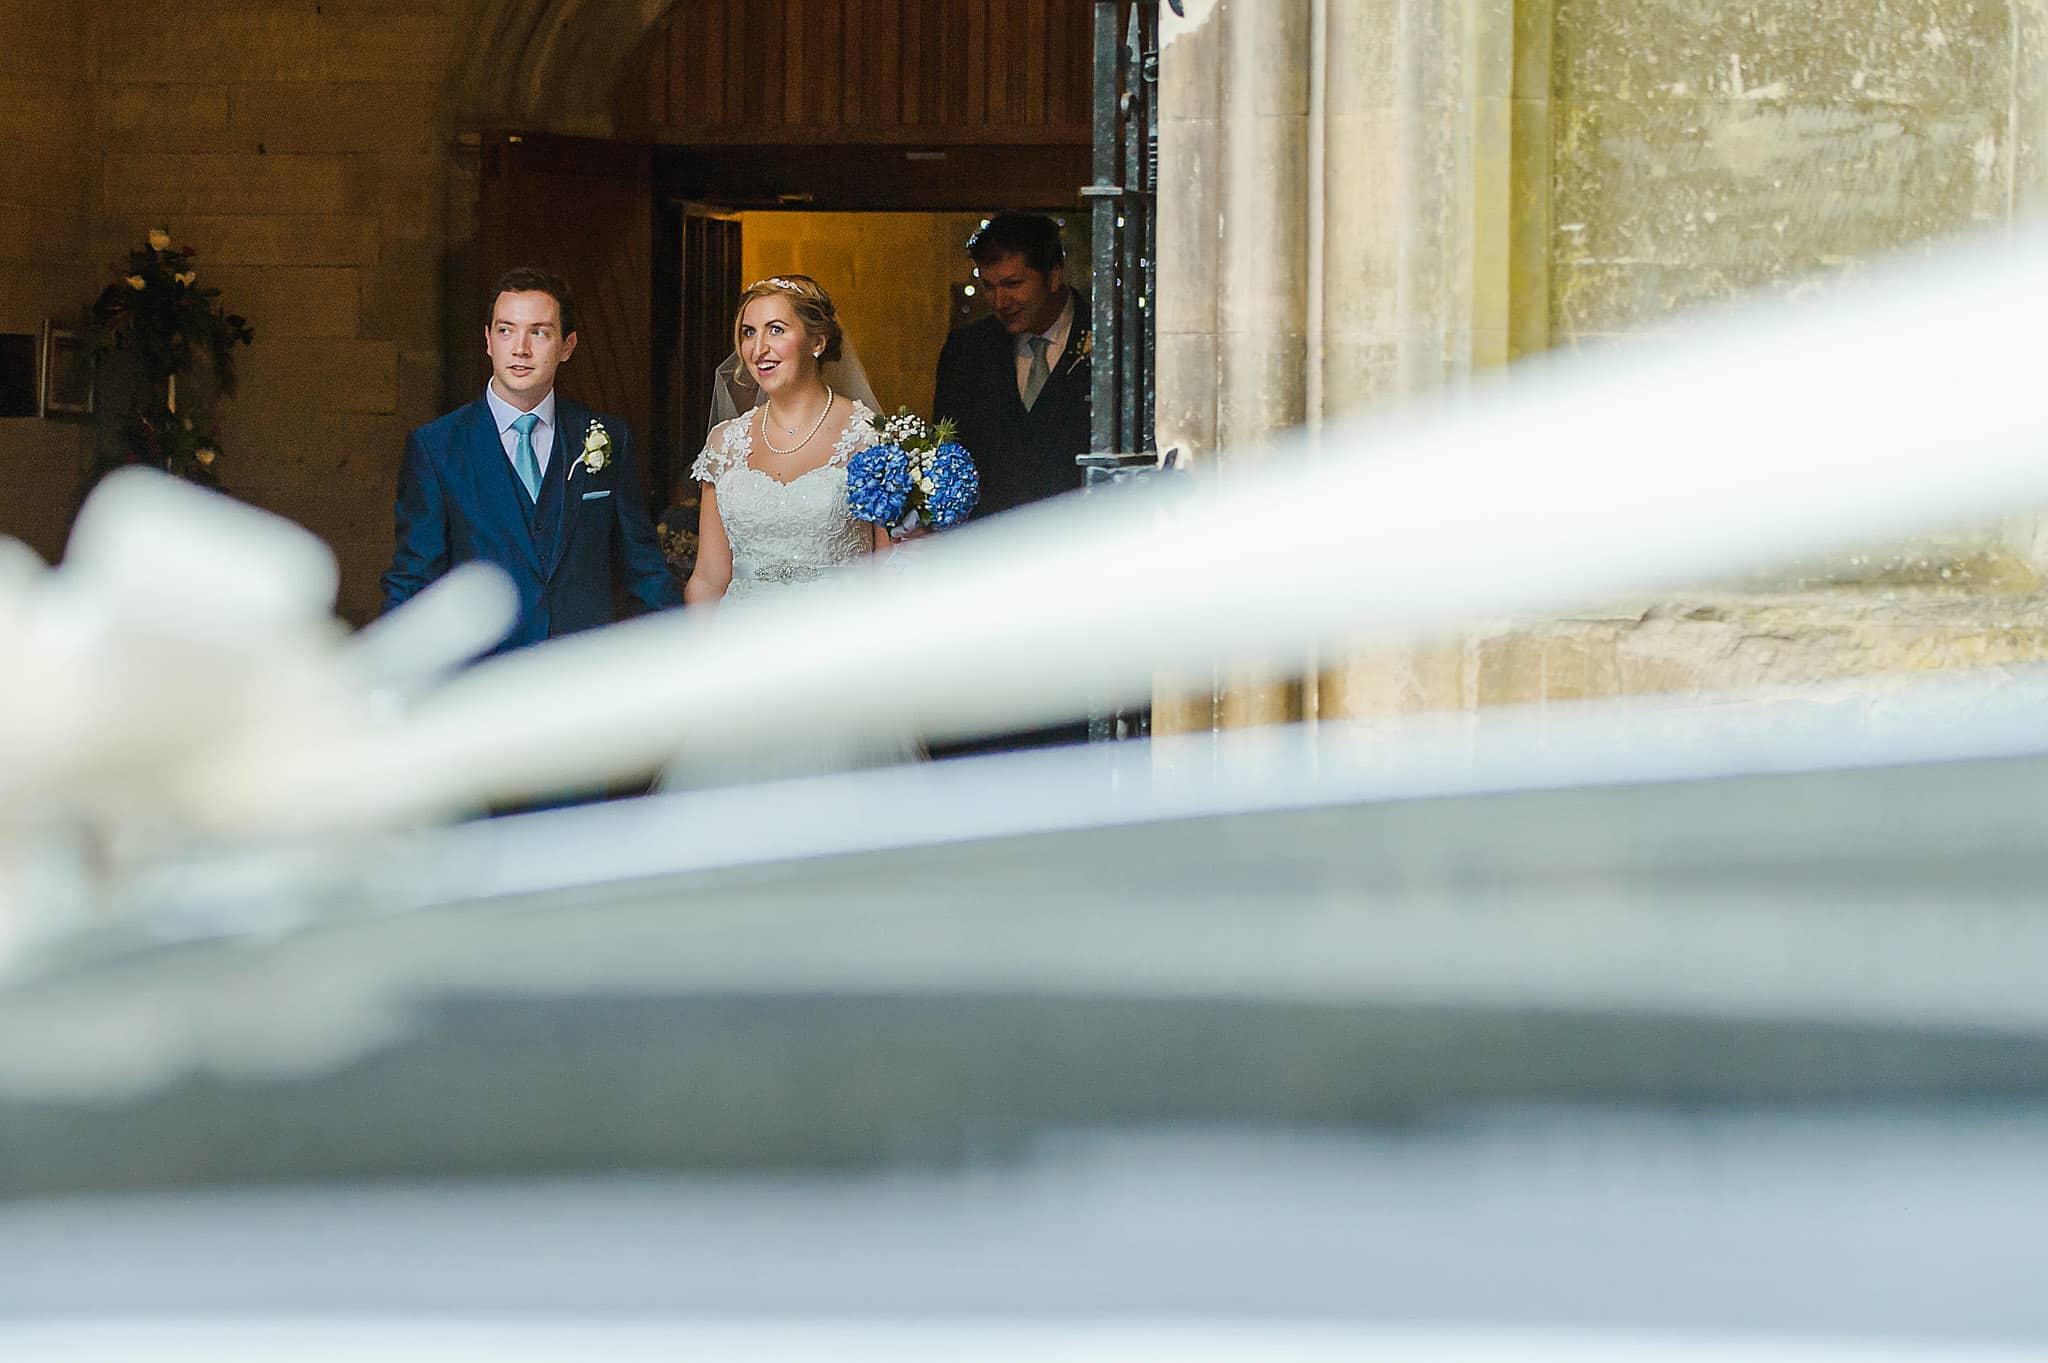 Deer Park Hall - Wedding Photography West Midlands 46